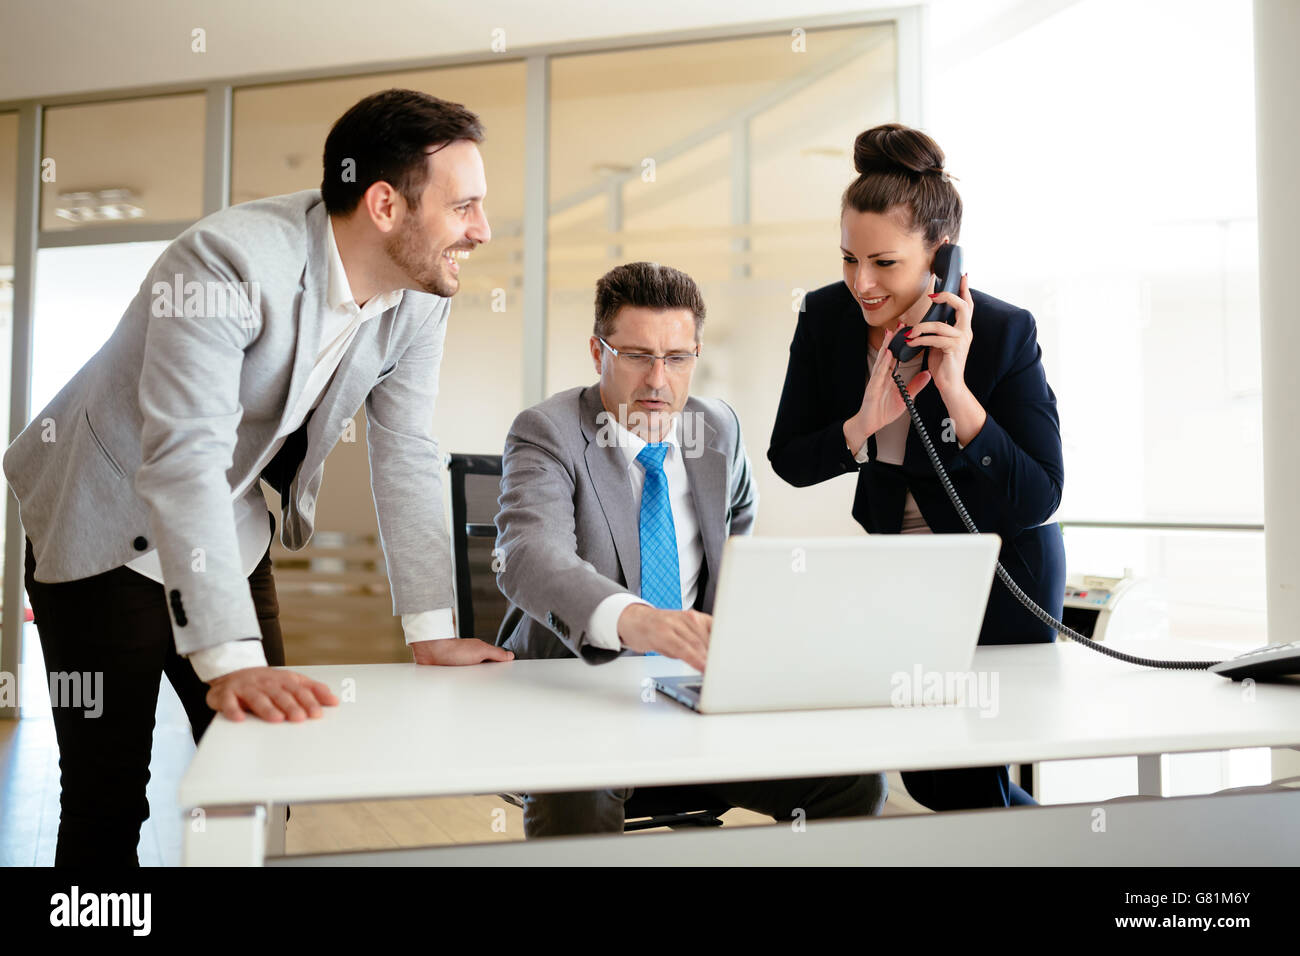 Secretaries assisting boss at business in office - Stock Image